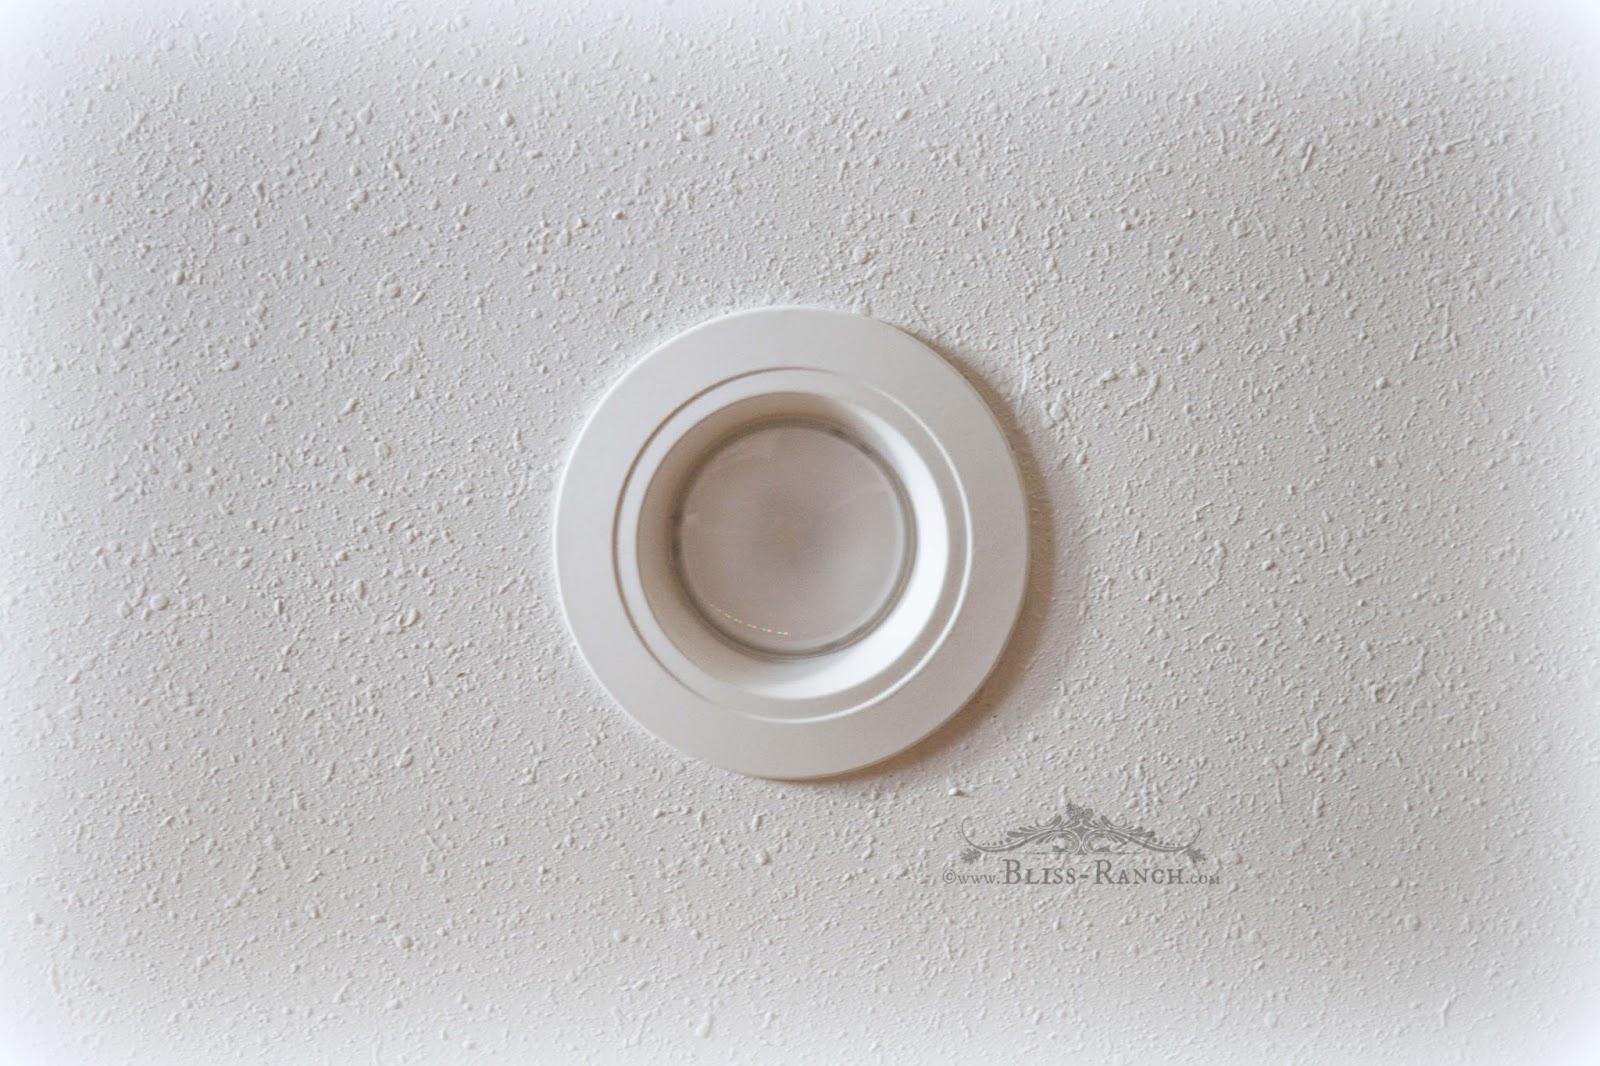 Bliss Ranch: LED Retrofit Kitchen Lights